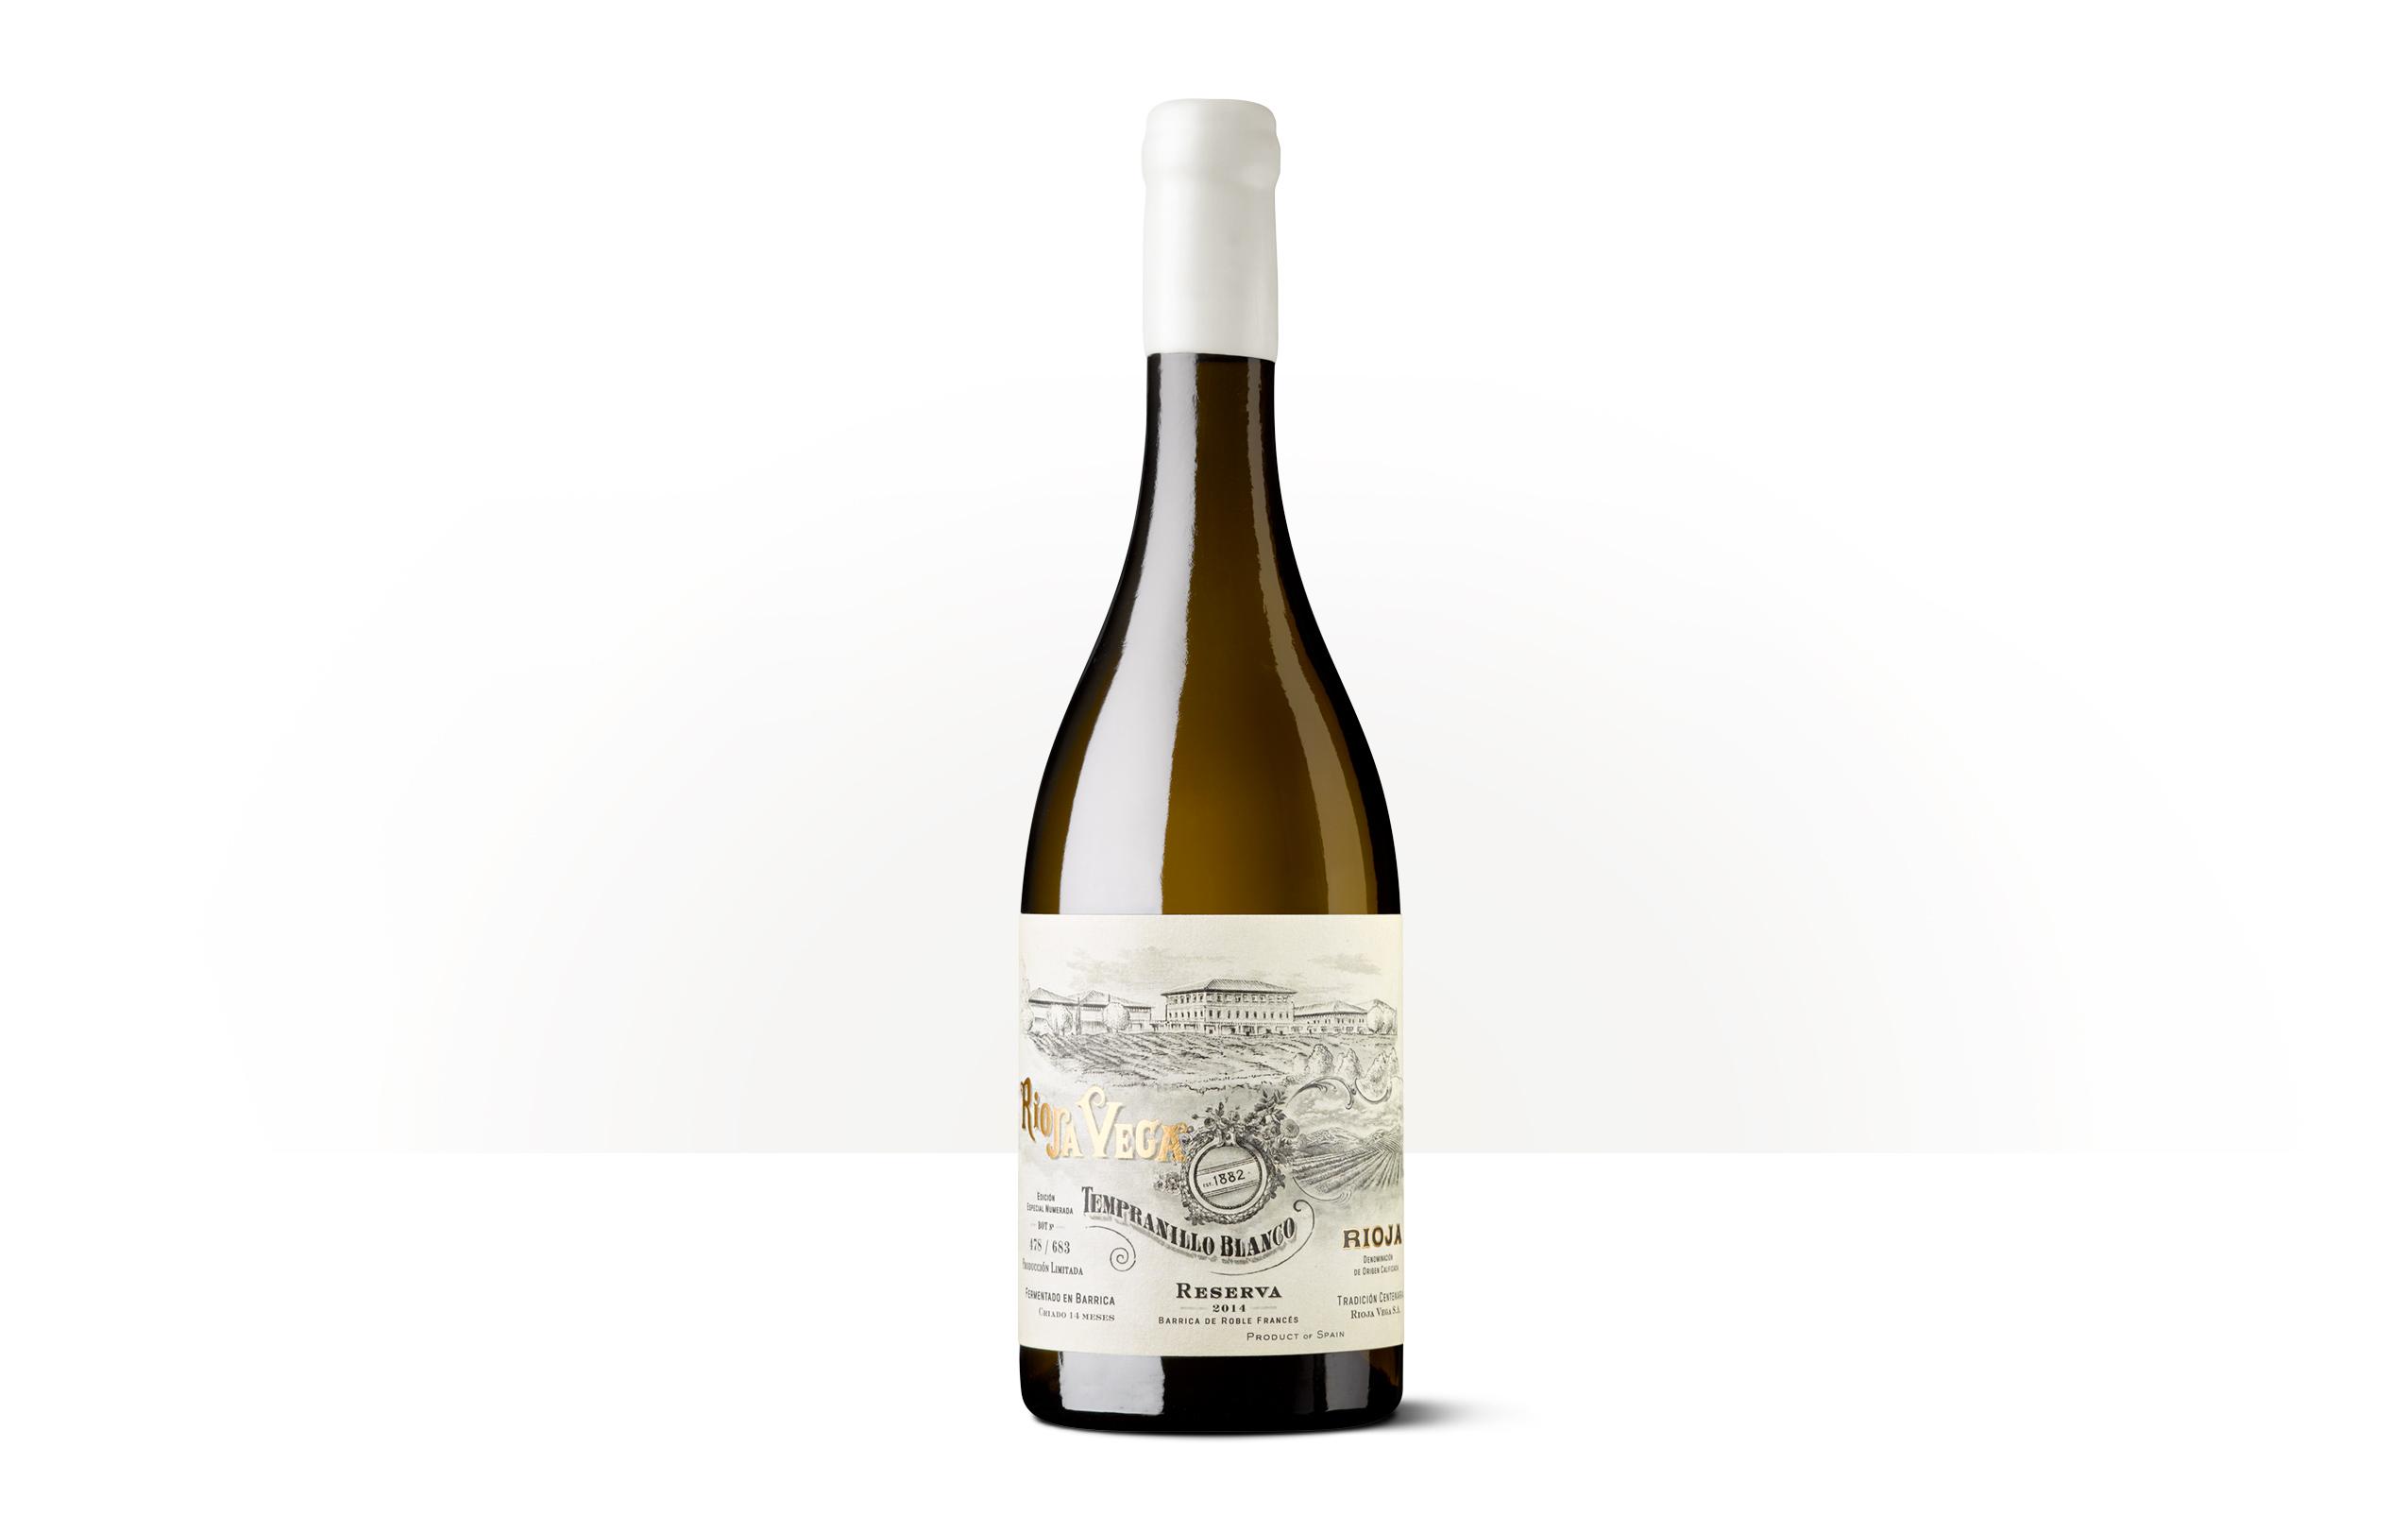 Silueta Rioja Vega Tempranillo